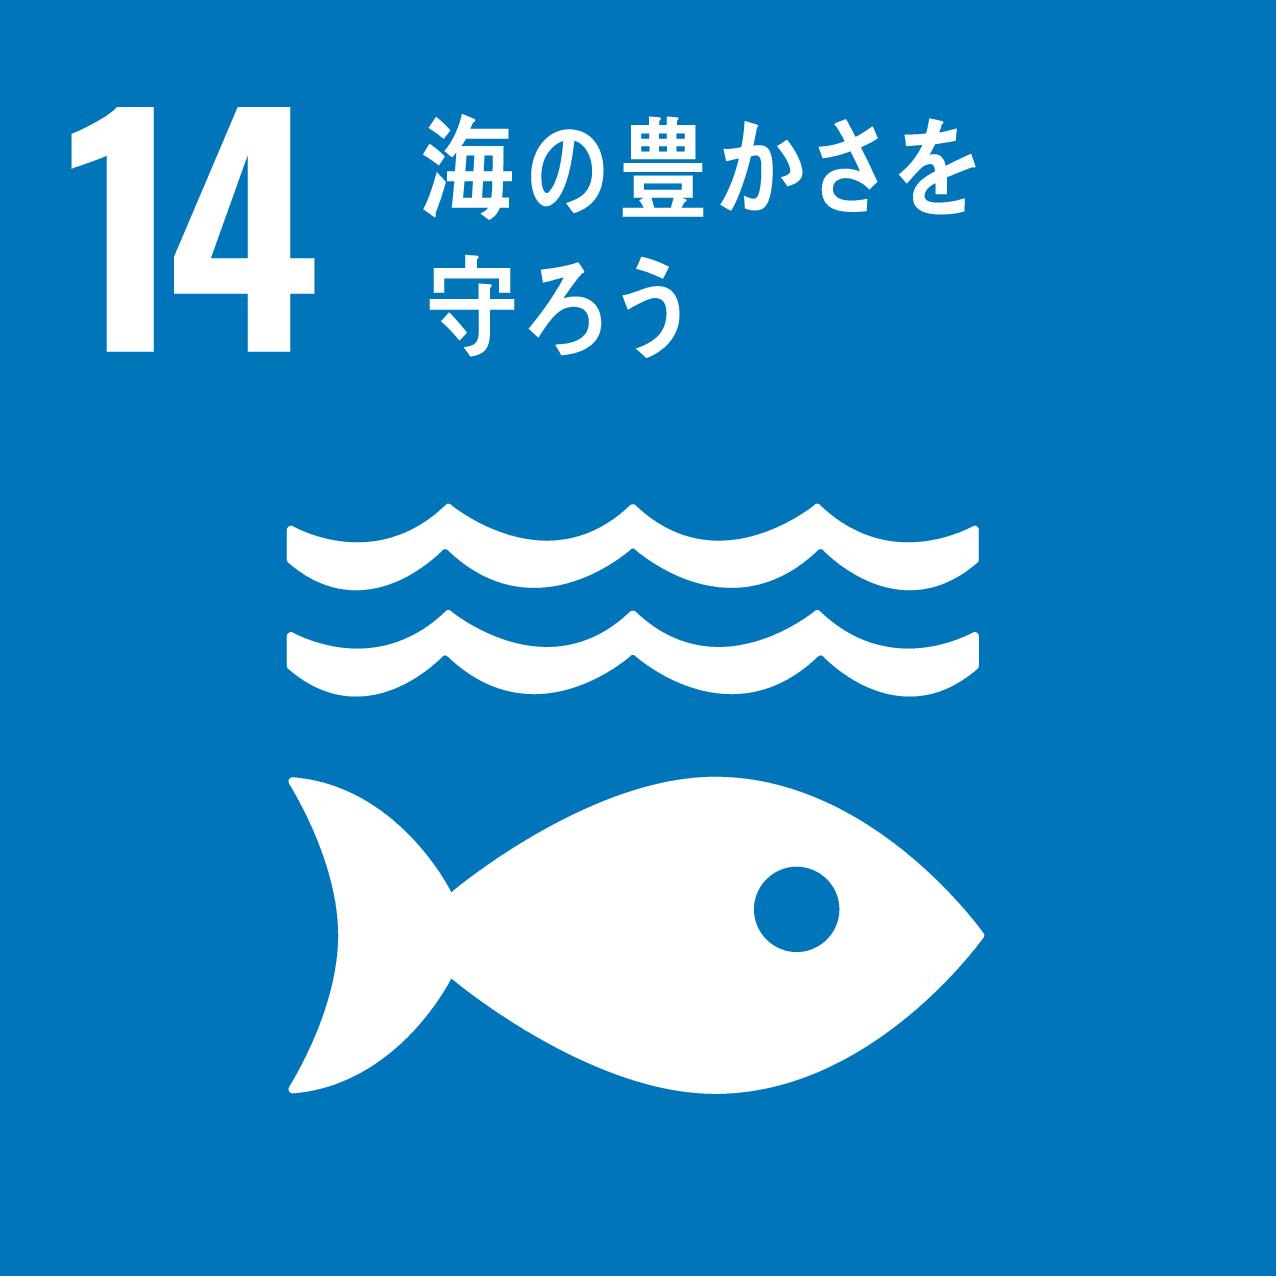 SDGsアイコン14.海の豊かさを守ろう